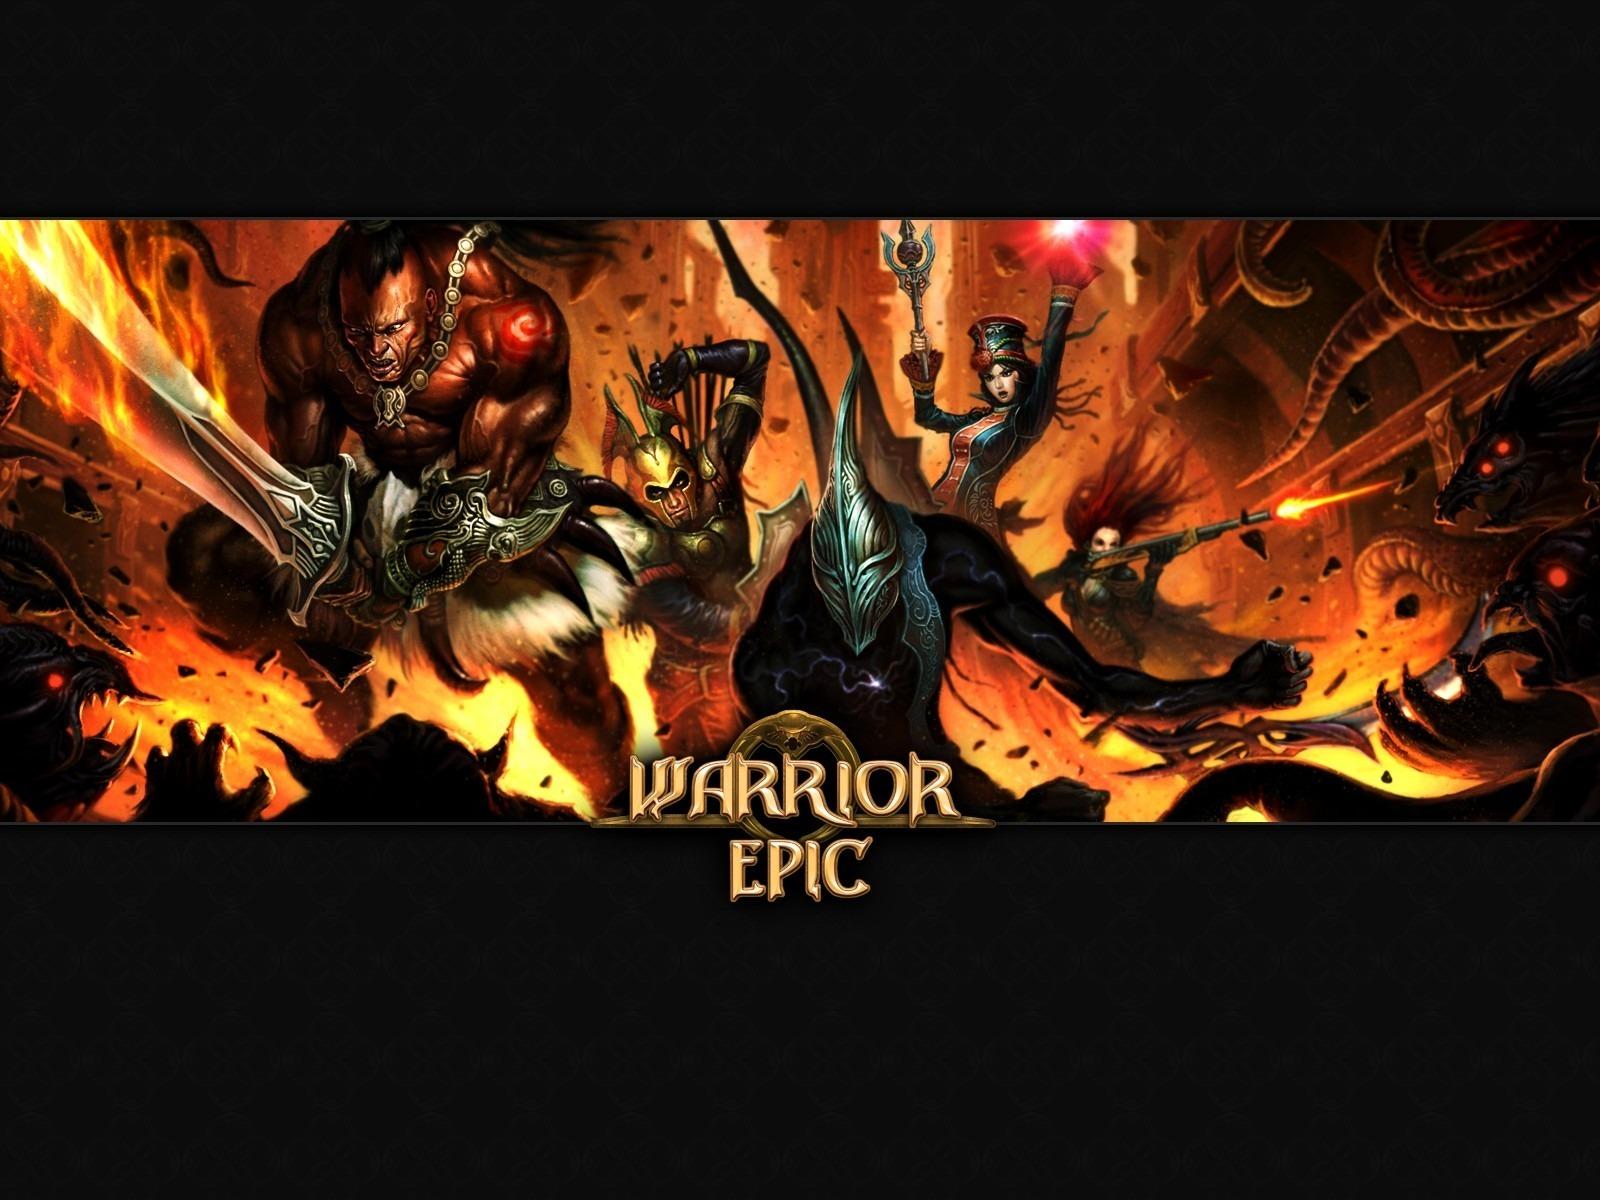 Warrior Epic wallpaper